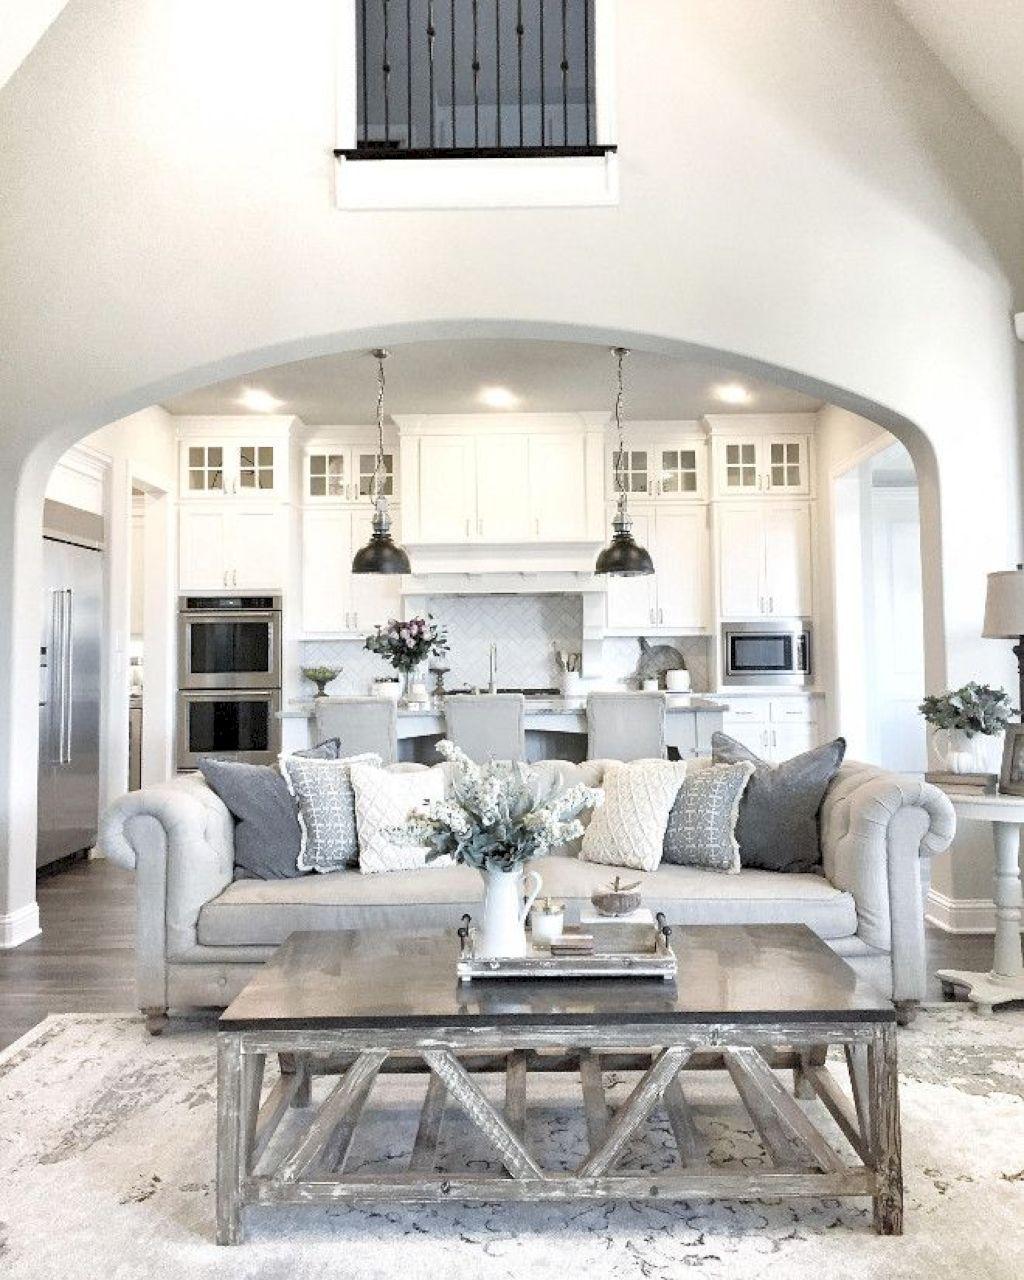 Adorable 27 Modern Farmhouse Living Room Decor and Design ...